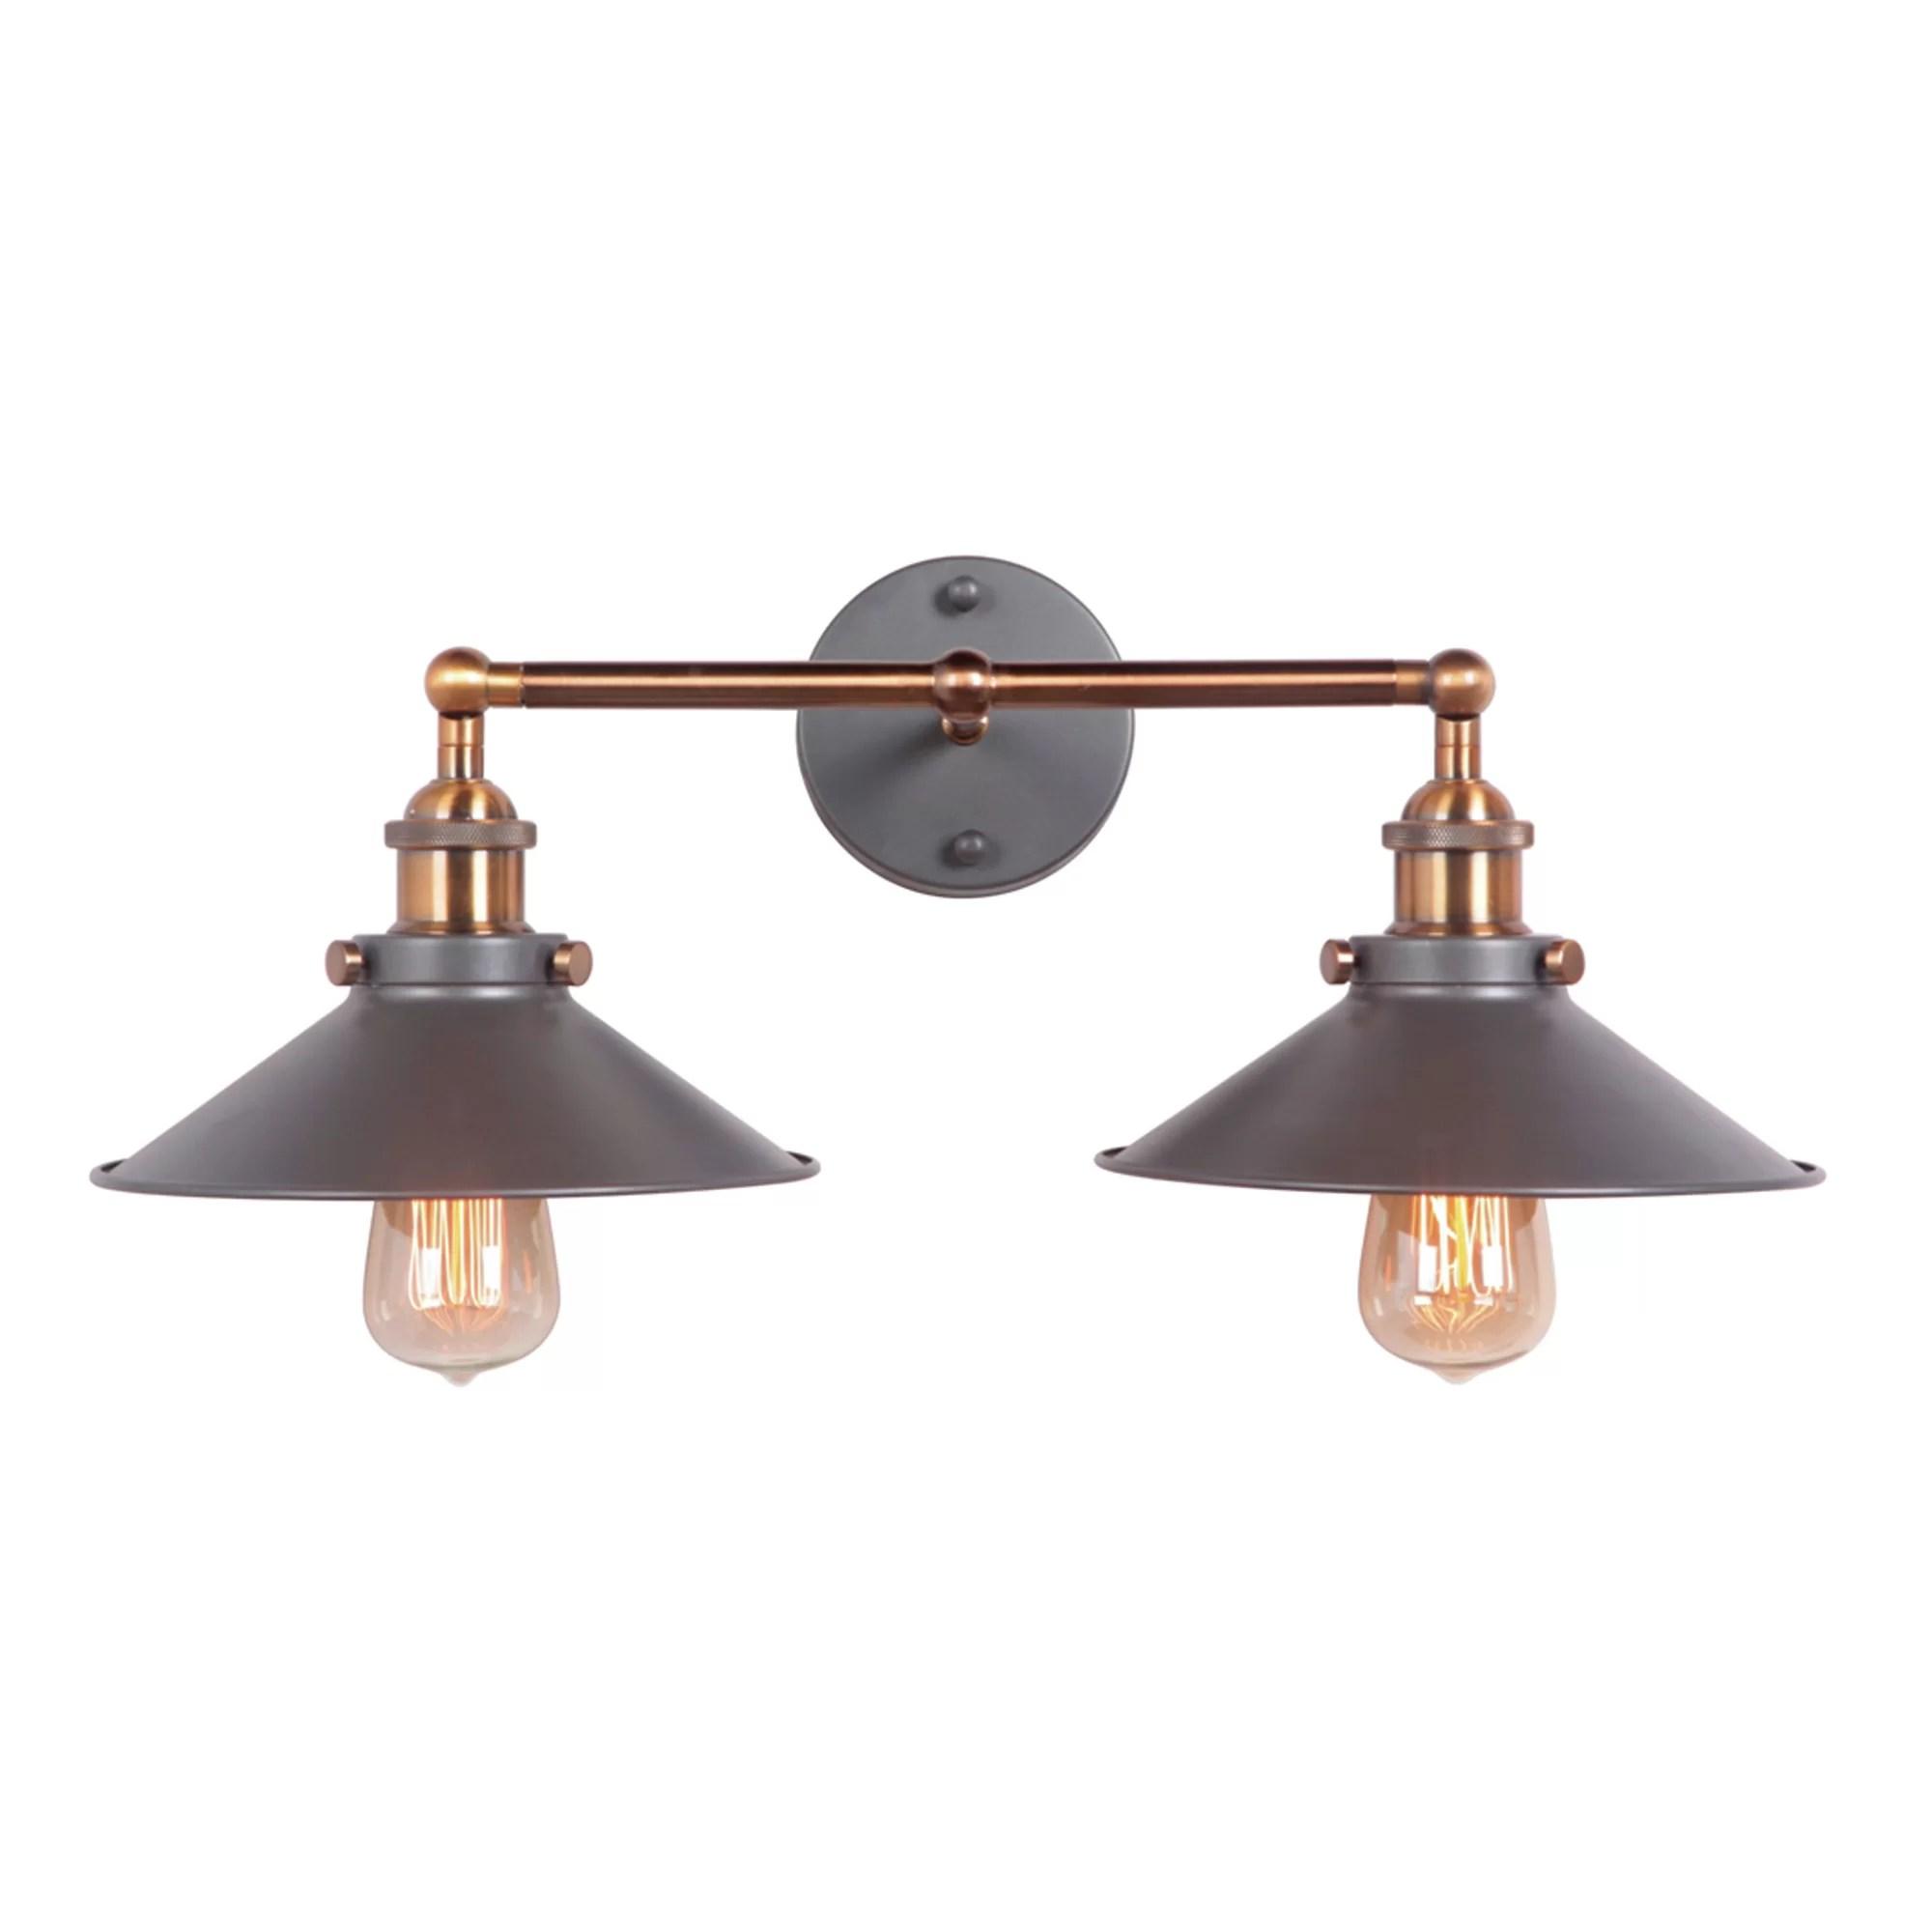 2 Light Wall Sconce | Wayfair on Wall Sconce Lighting Decor id=79667